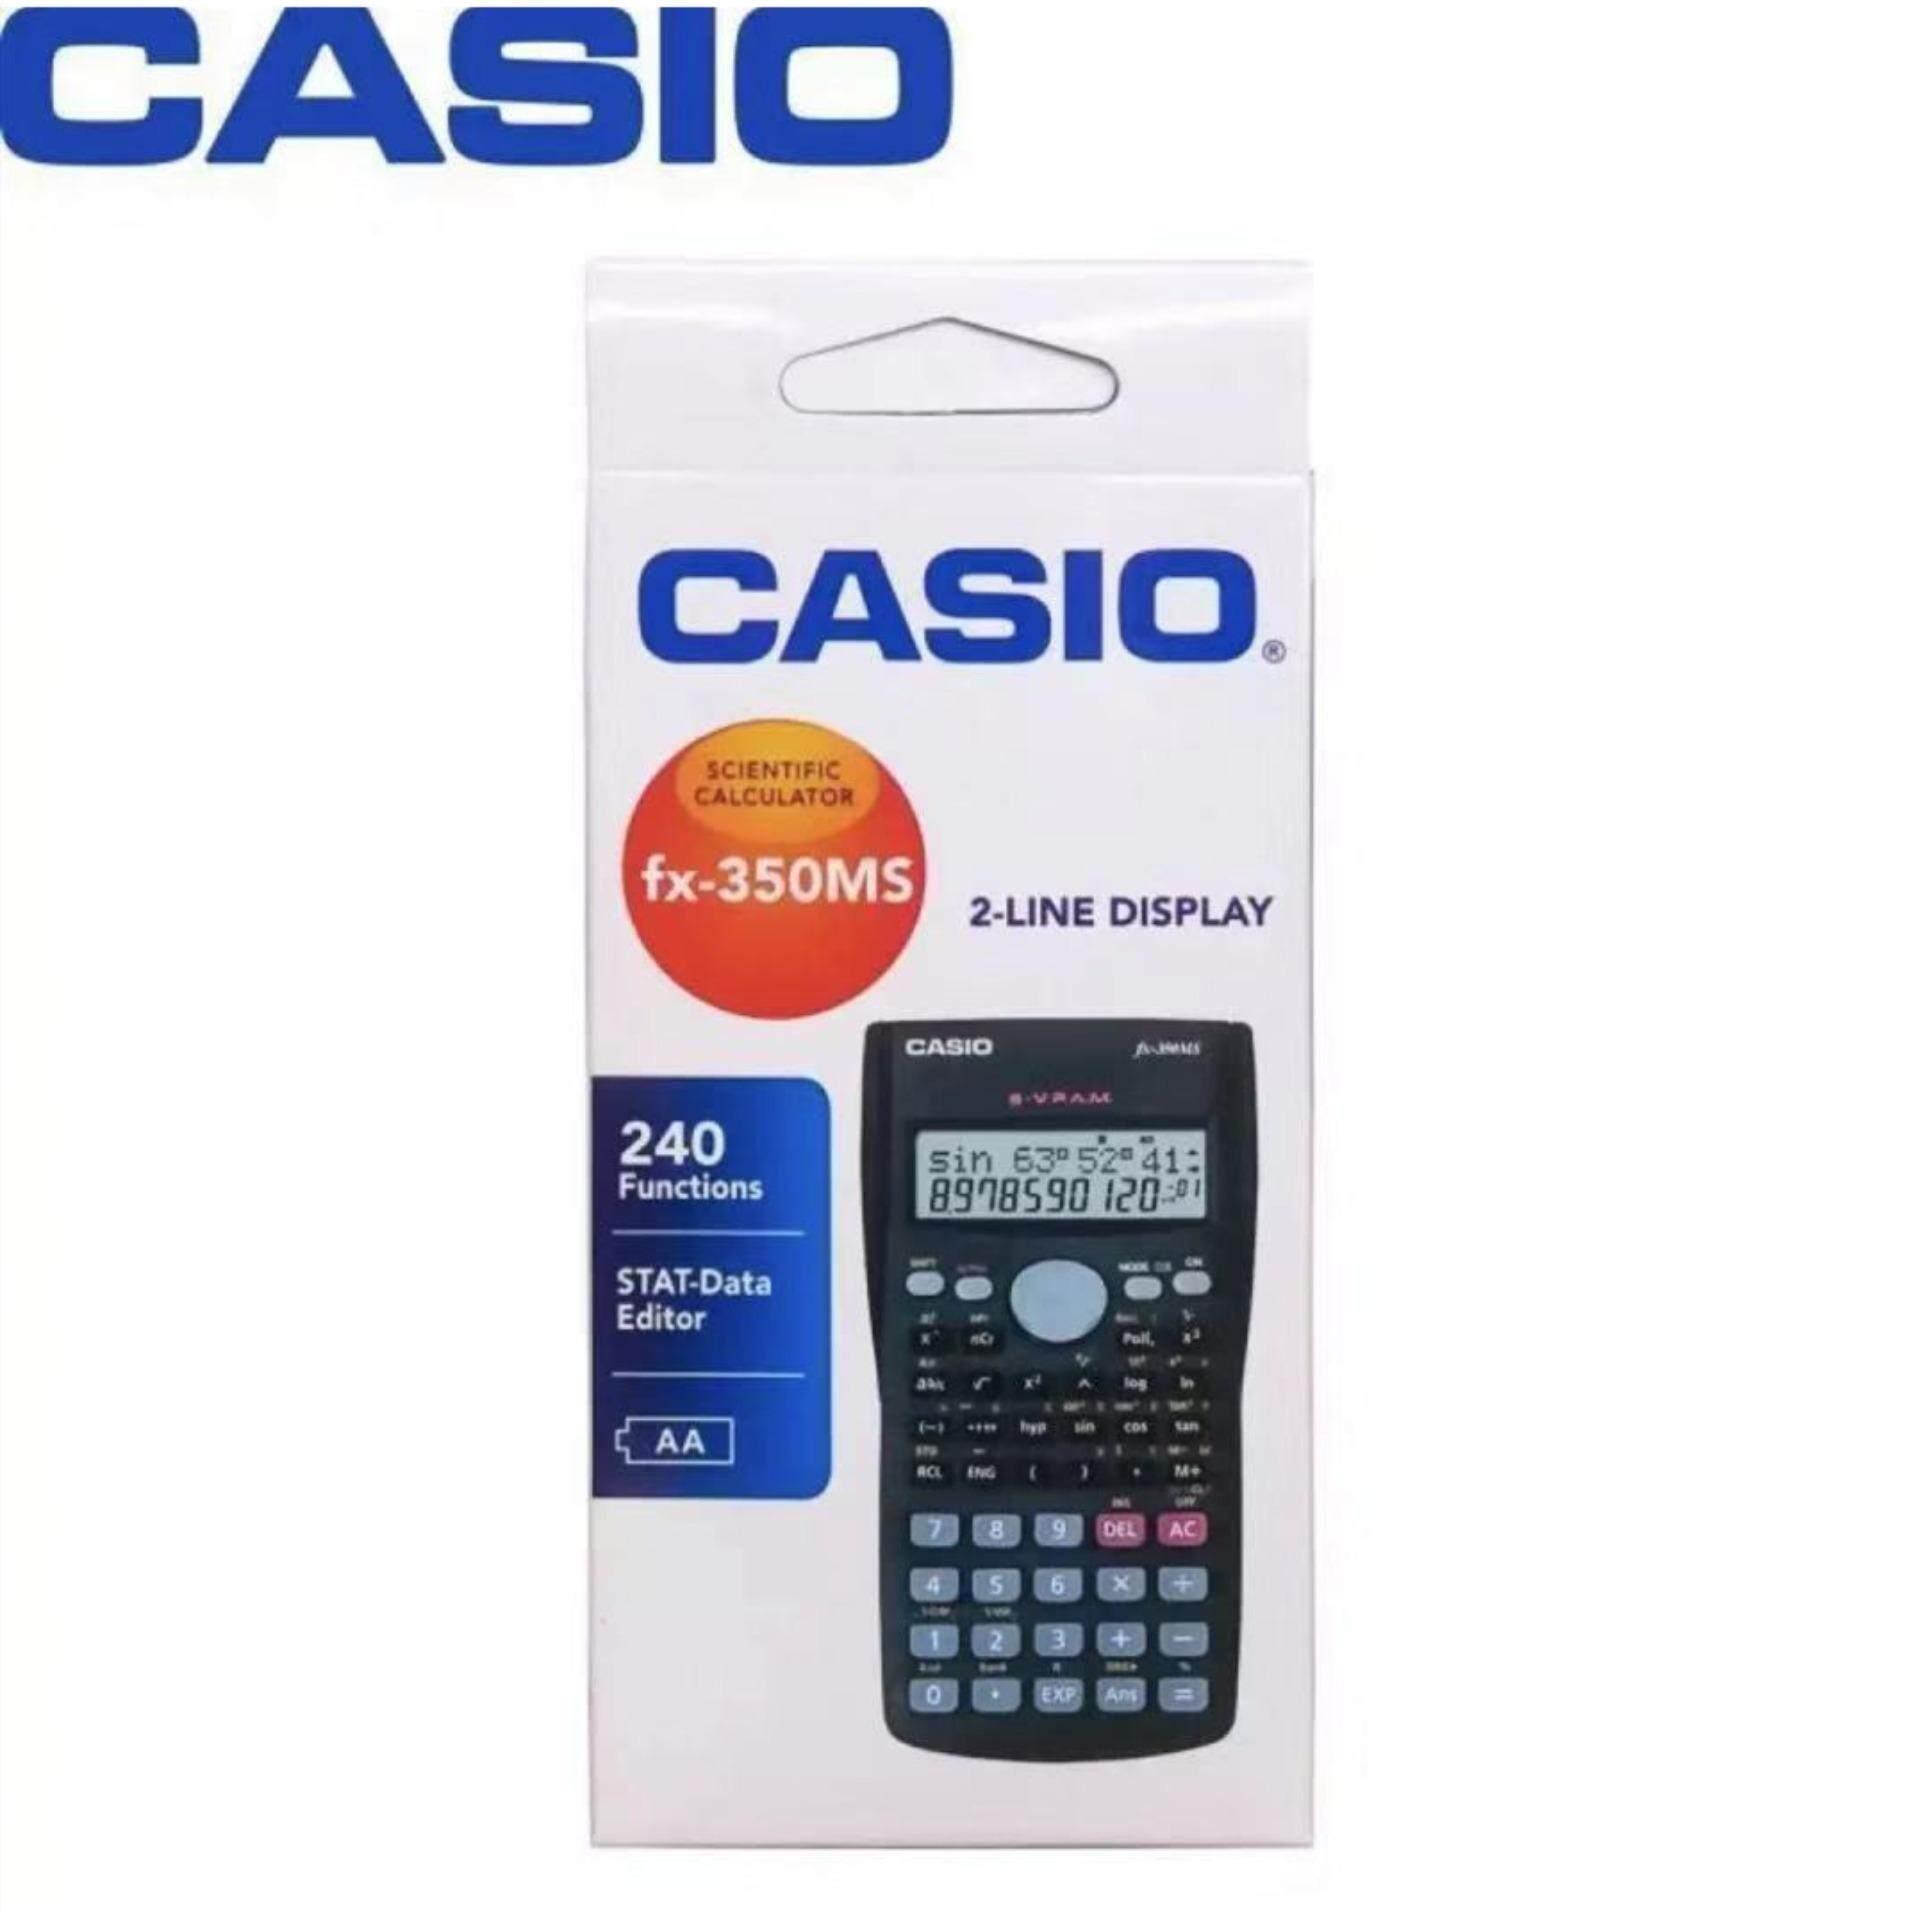 Casio เครื่องคิดเลขวิทยาศาสตร์ รุ่น Fx-350ms.